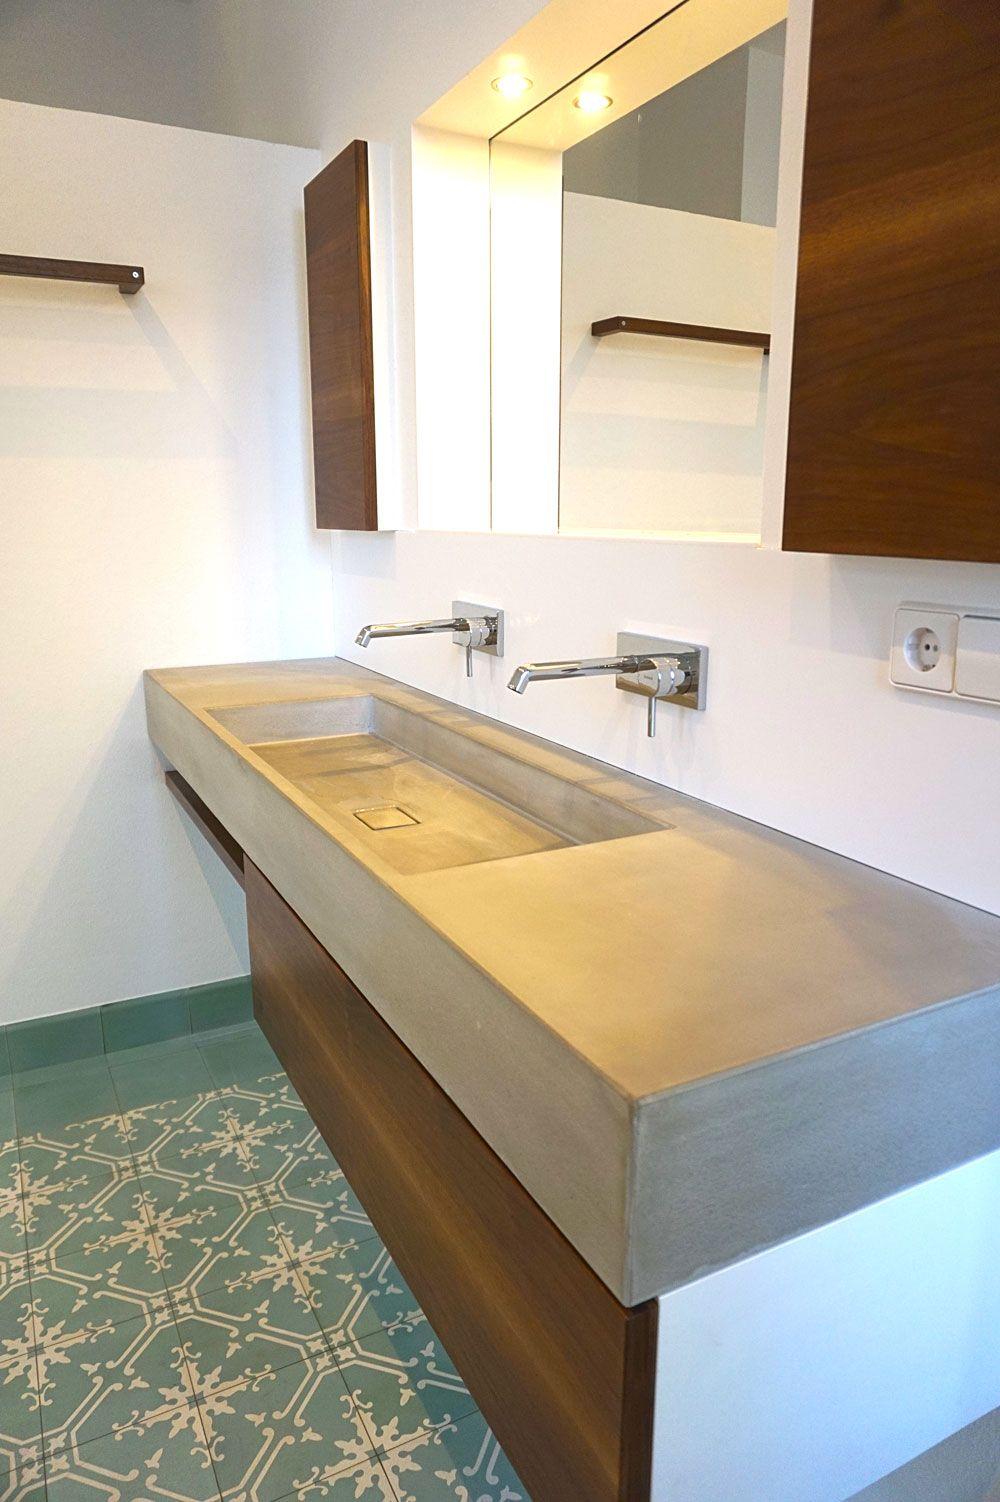 neues bad im denkmal waschtische aus beton betonm bel urbandesigners for the home. Black Bedroom Furniture Sets. Home Design Ideas